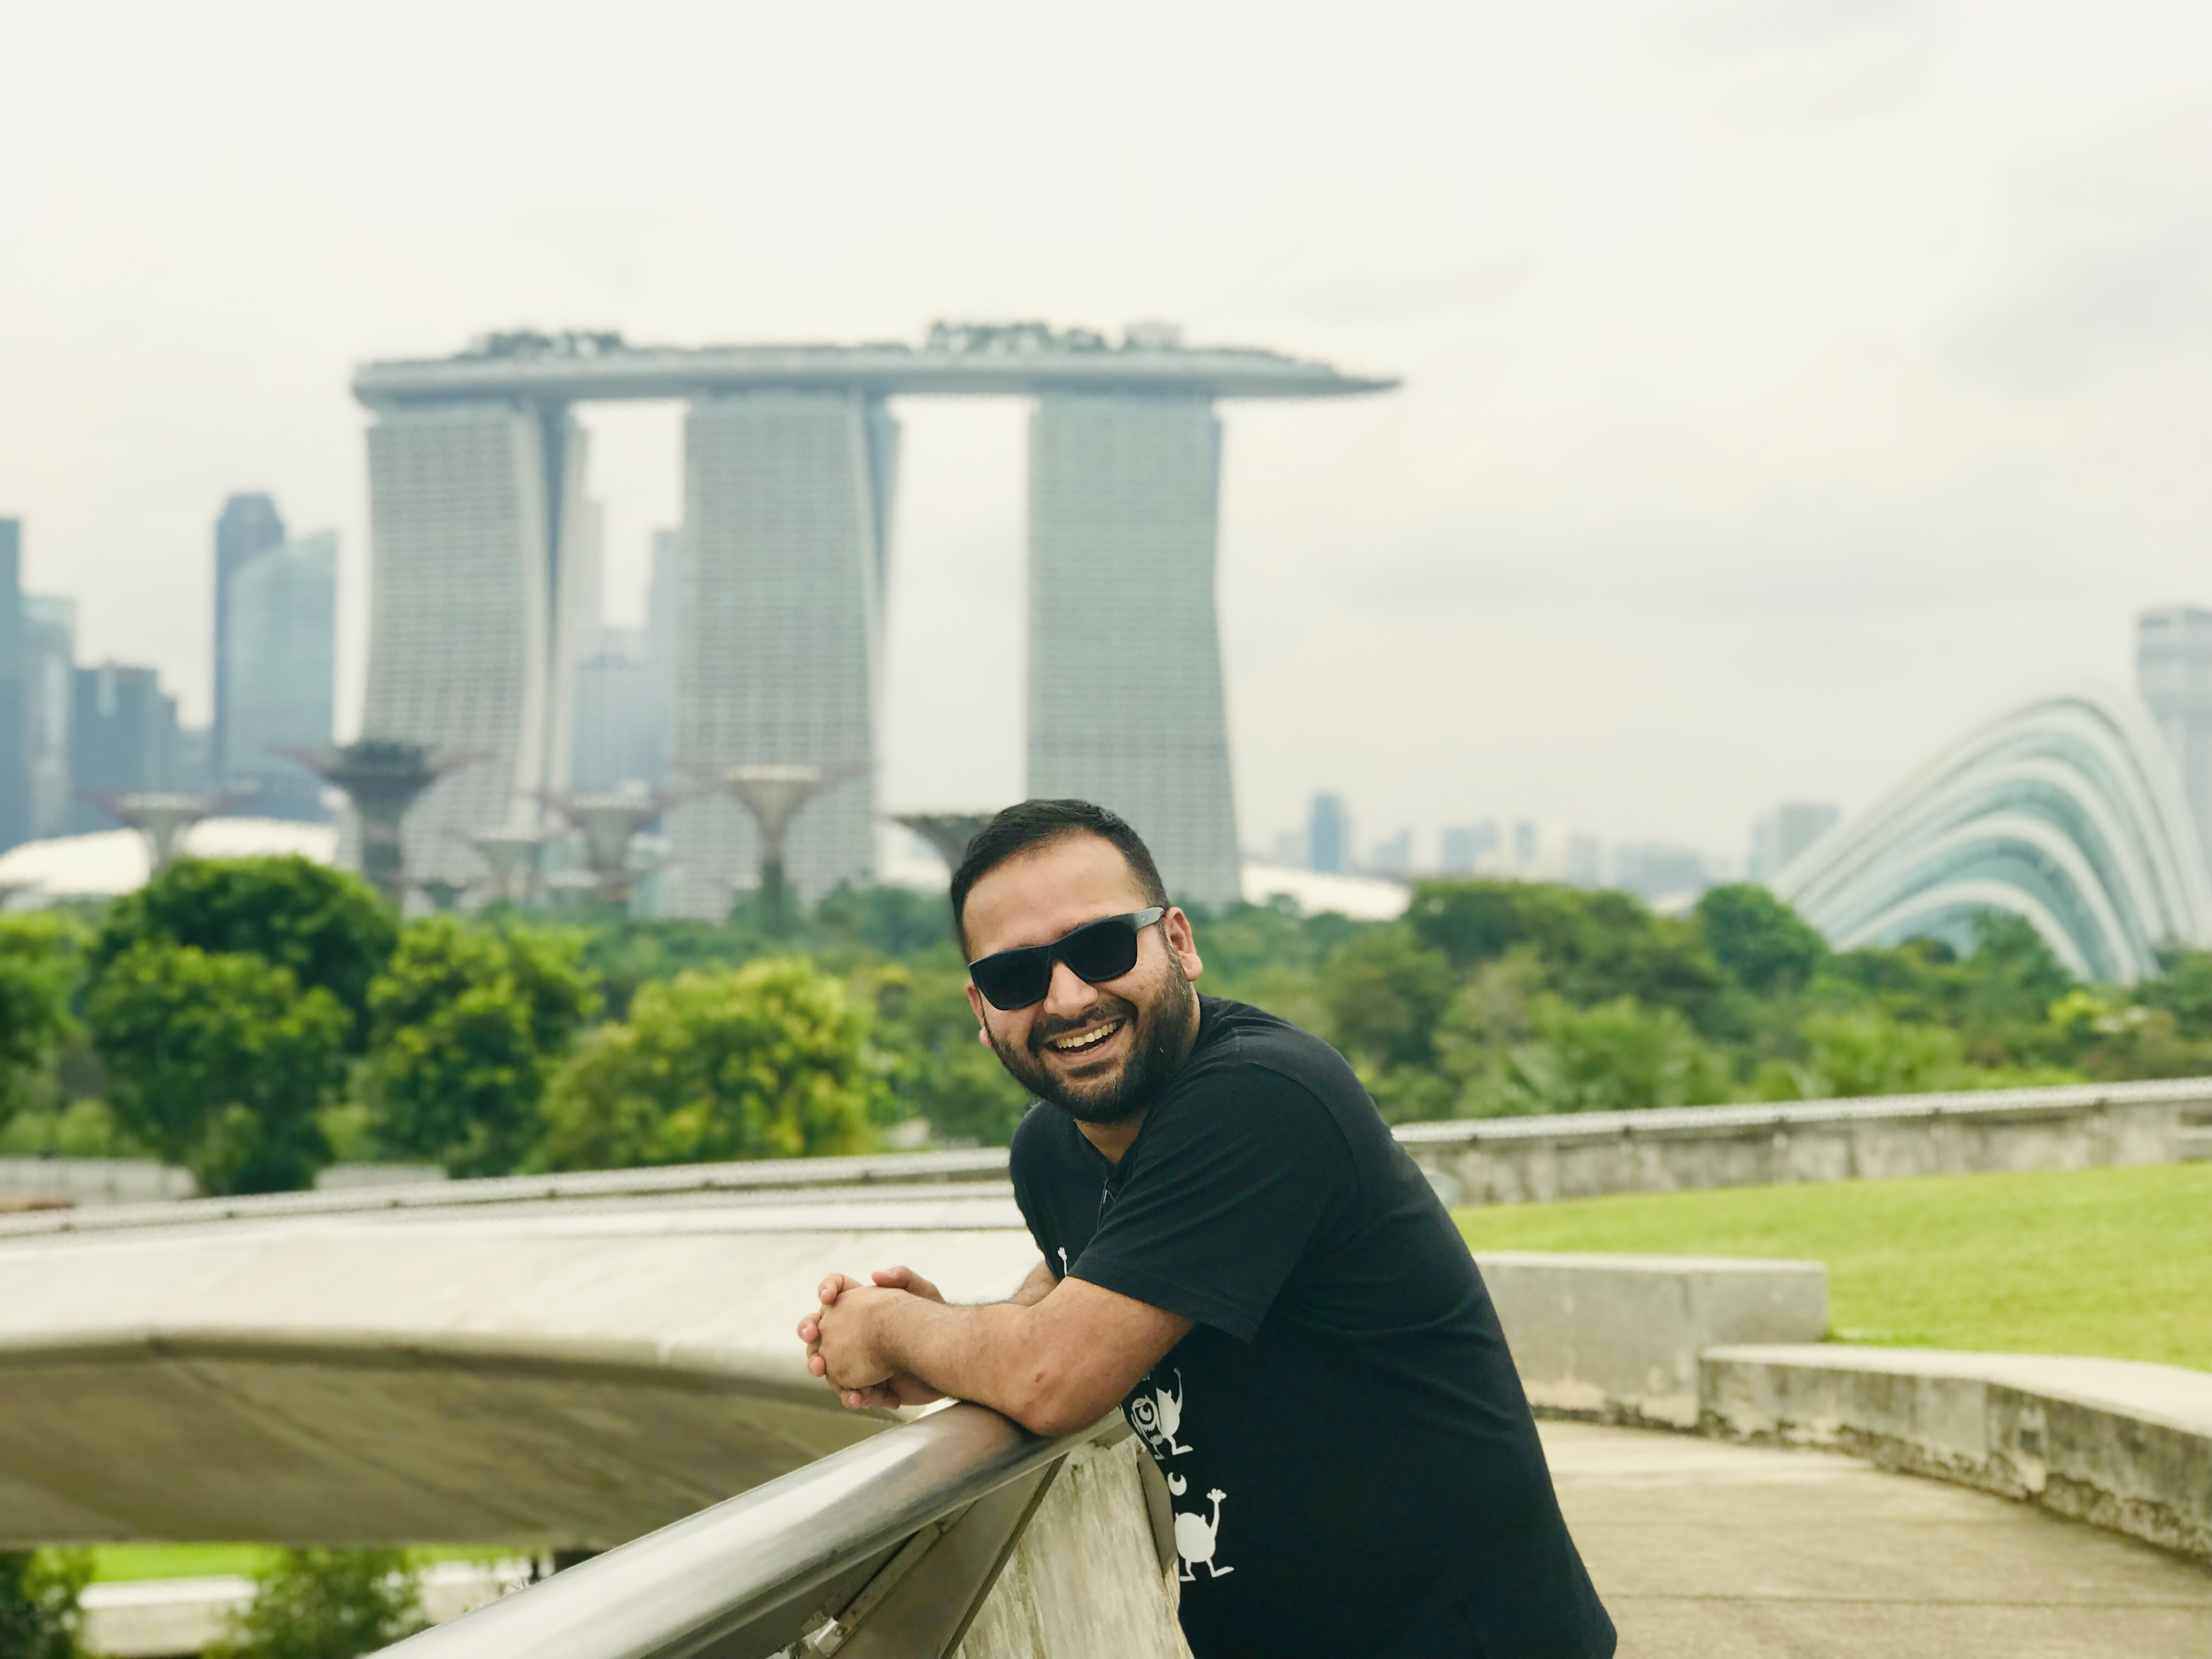 A happy moment captured at Marina Barrage.